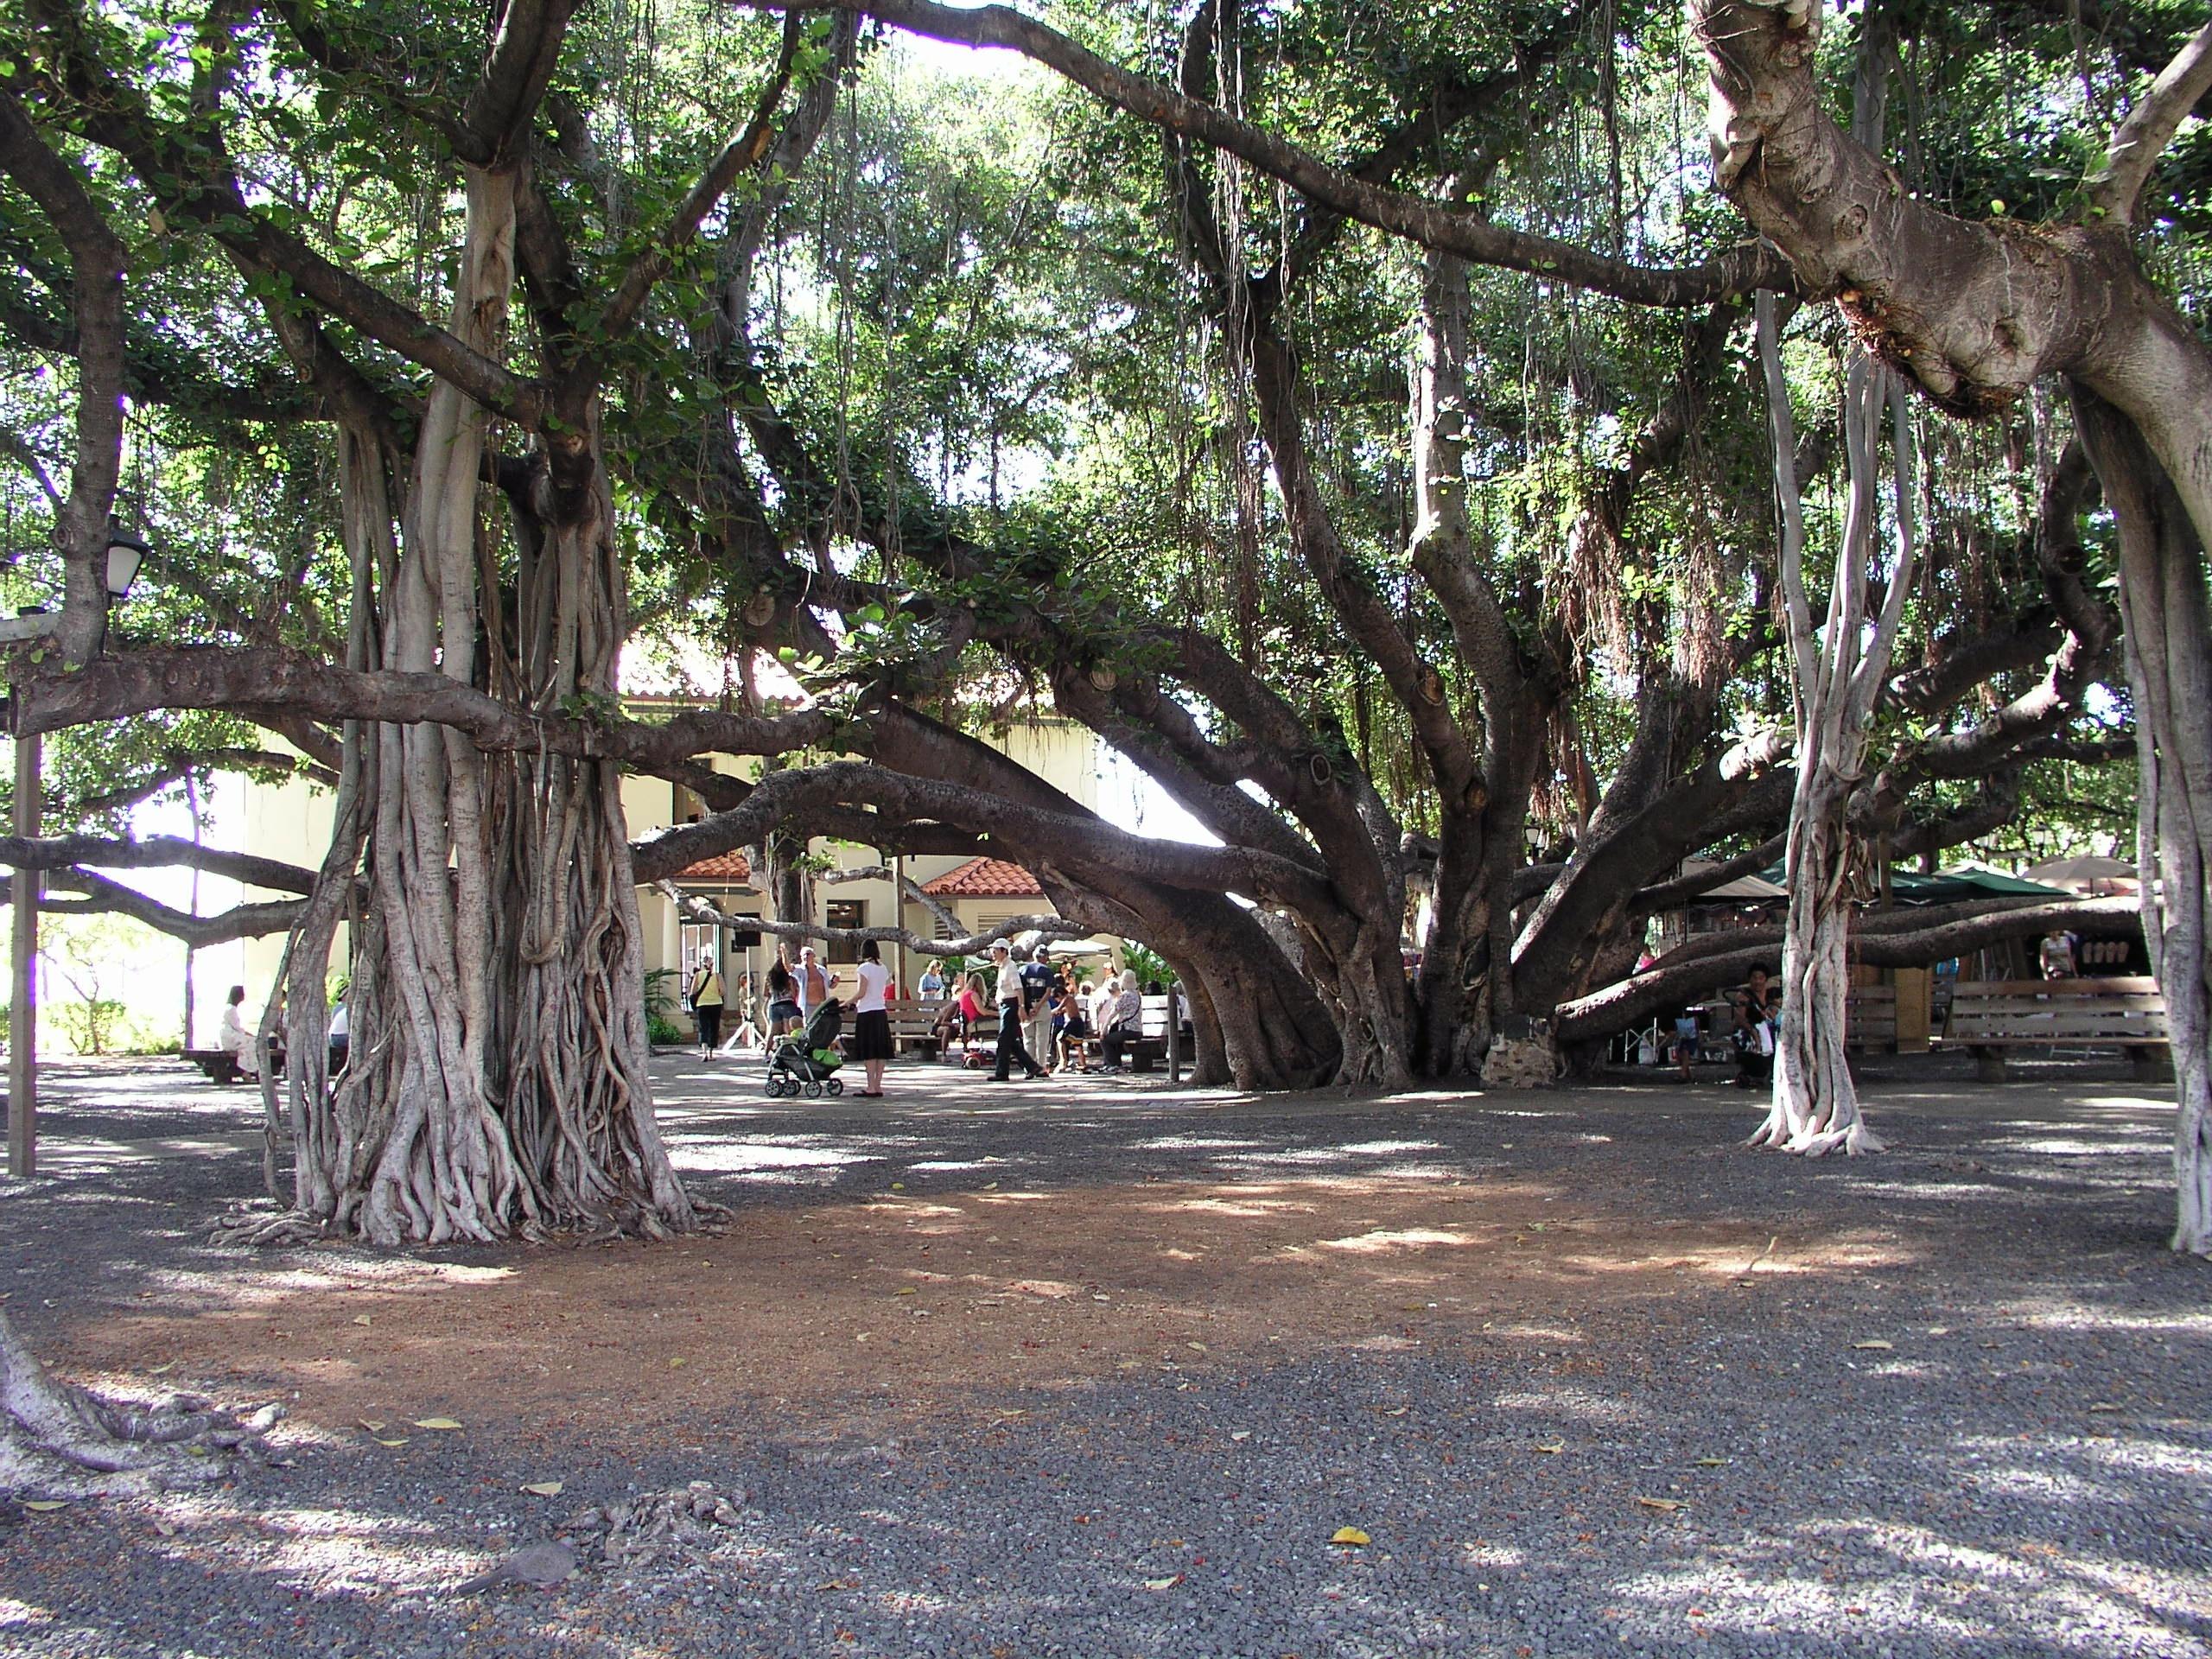 Banyan-tree-Lahaina-Hawaii.jpg English: A banyan tree (Ficus benghalensis ) in Banyan Tree Park - Lahaina, Hawaii. Русский: Баньян (разновидность